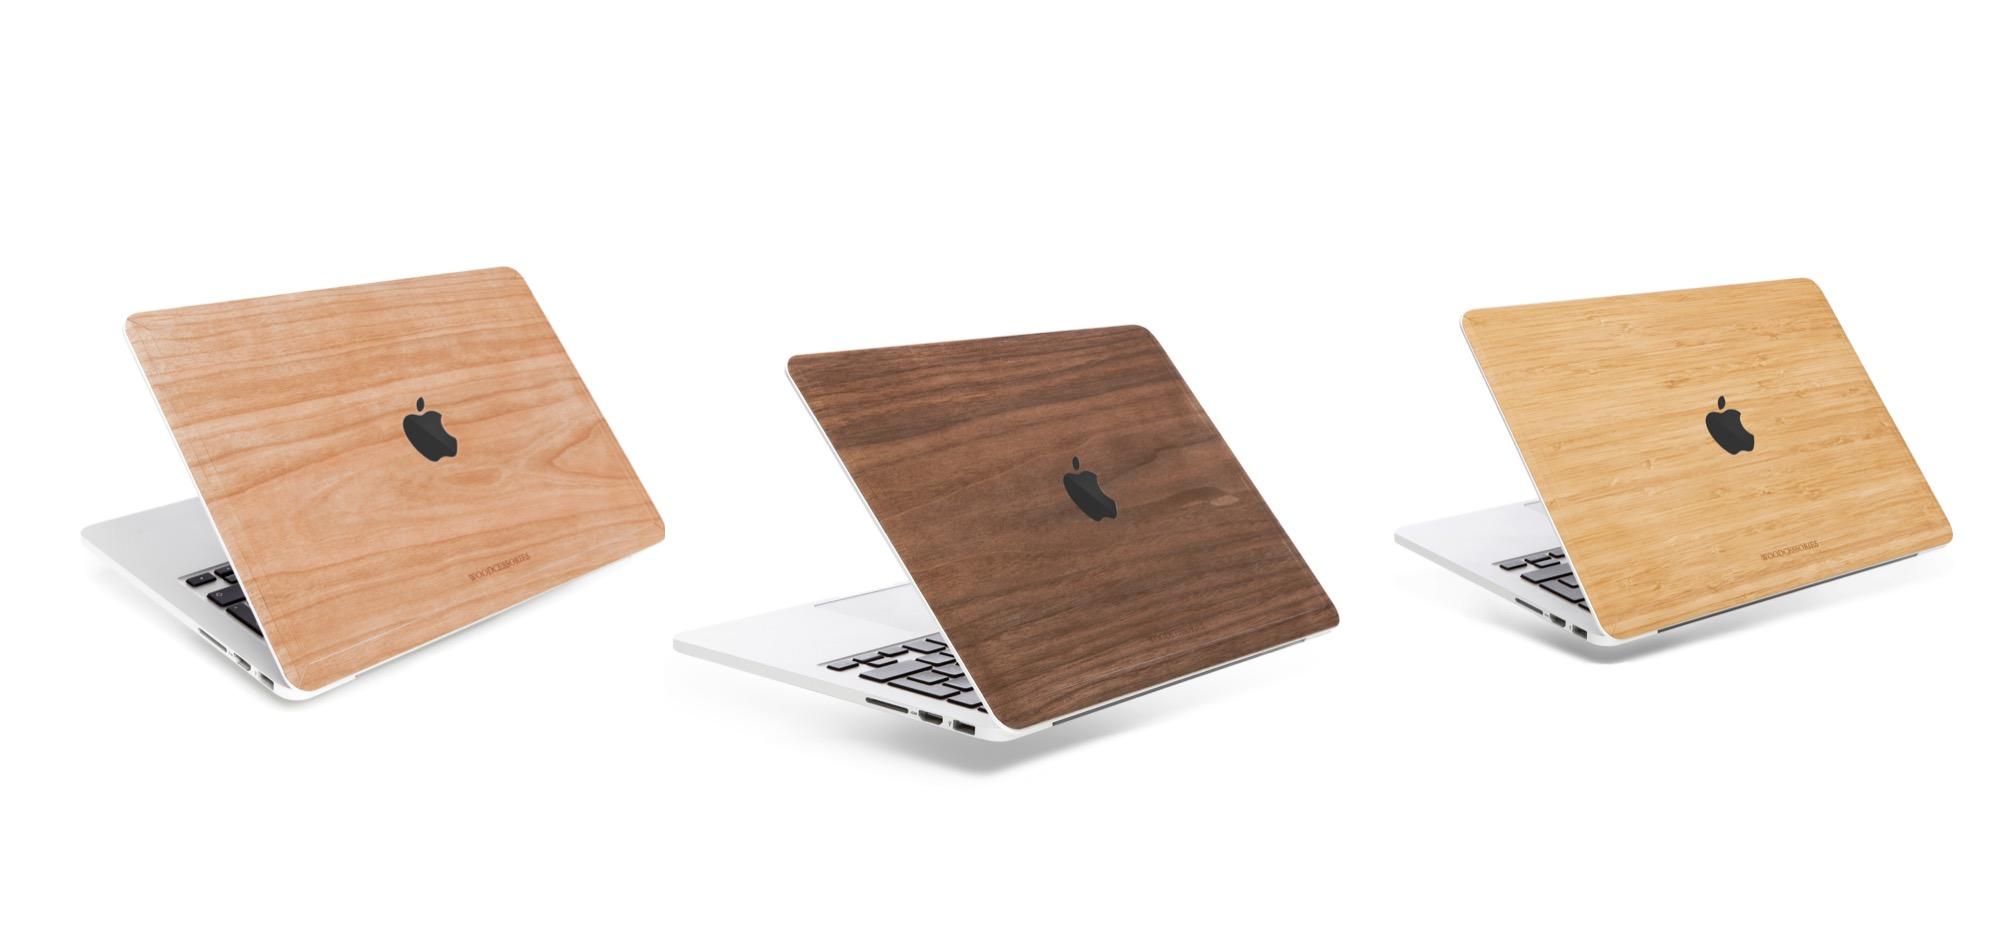 woodcessories-holz-macbook-cover-pro-touchbar-2016-15-13-sticker-klebefolie-decal-woodFolie3